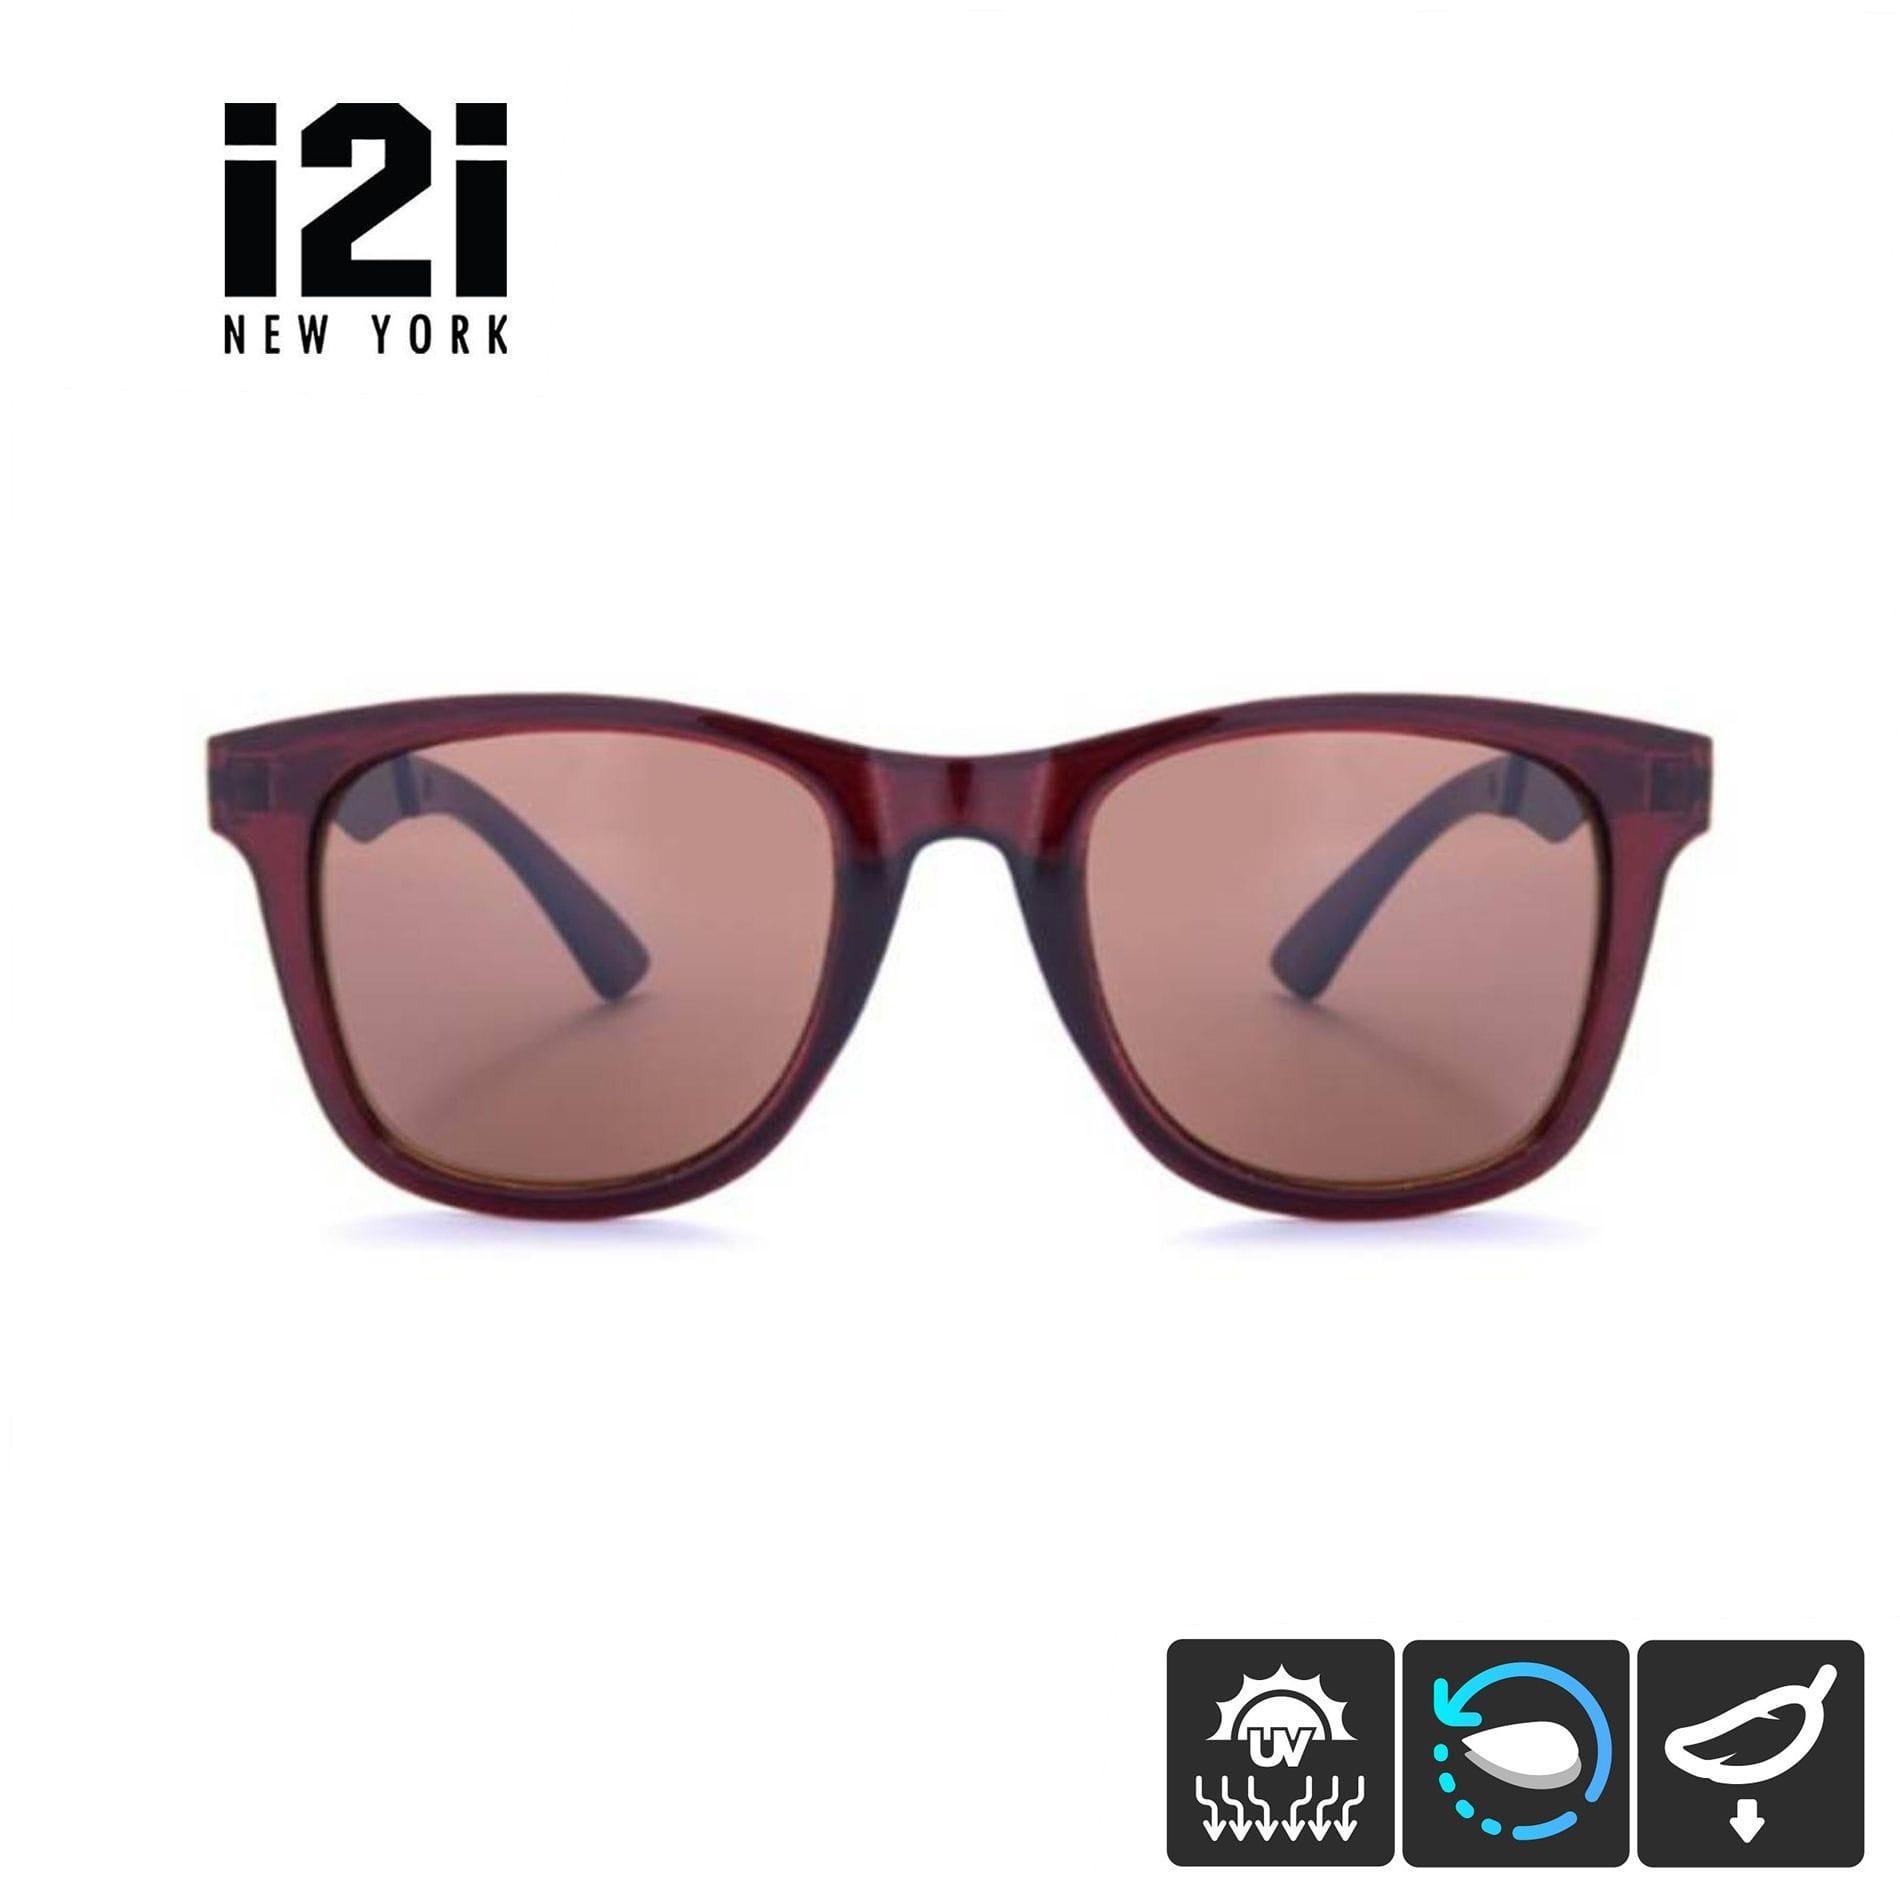 ef3aa010d662b I2I New York Glasses Philippines - I2I New York Eyewear for sale ...